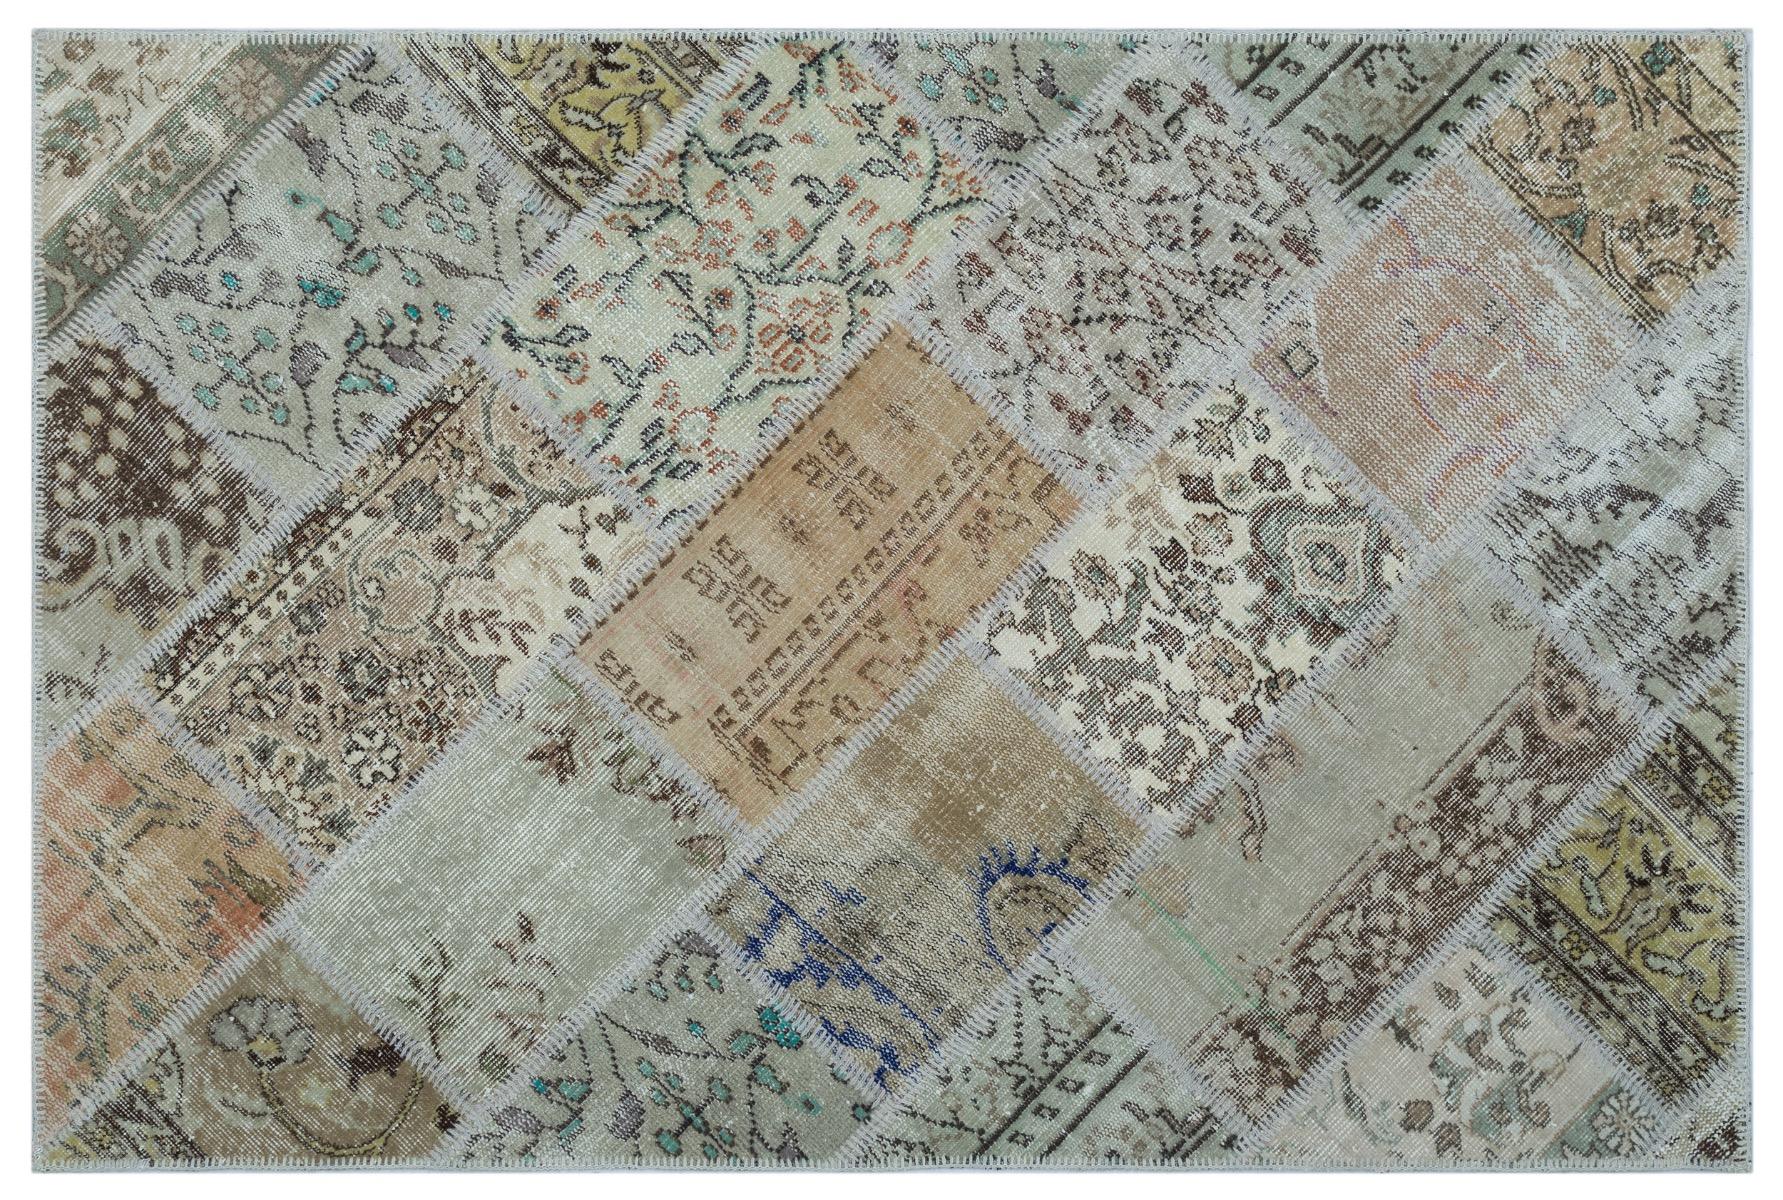 patchwork vloerkleed beige nr.26556 180cm x 120cm